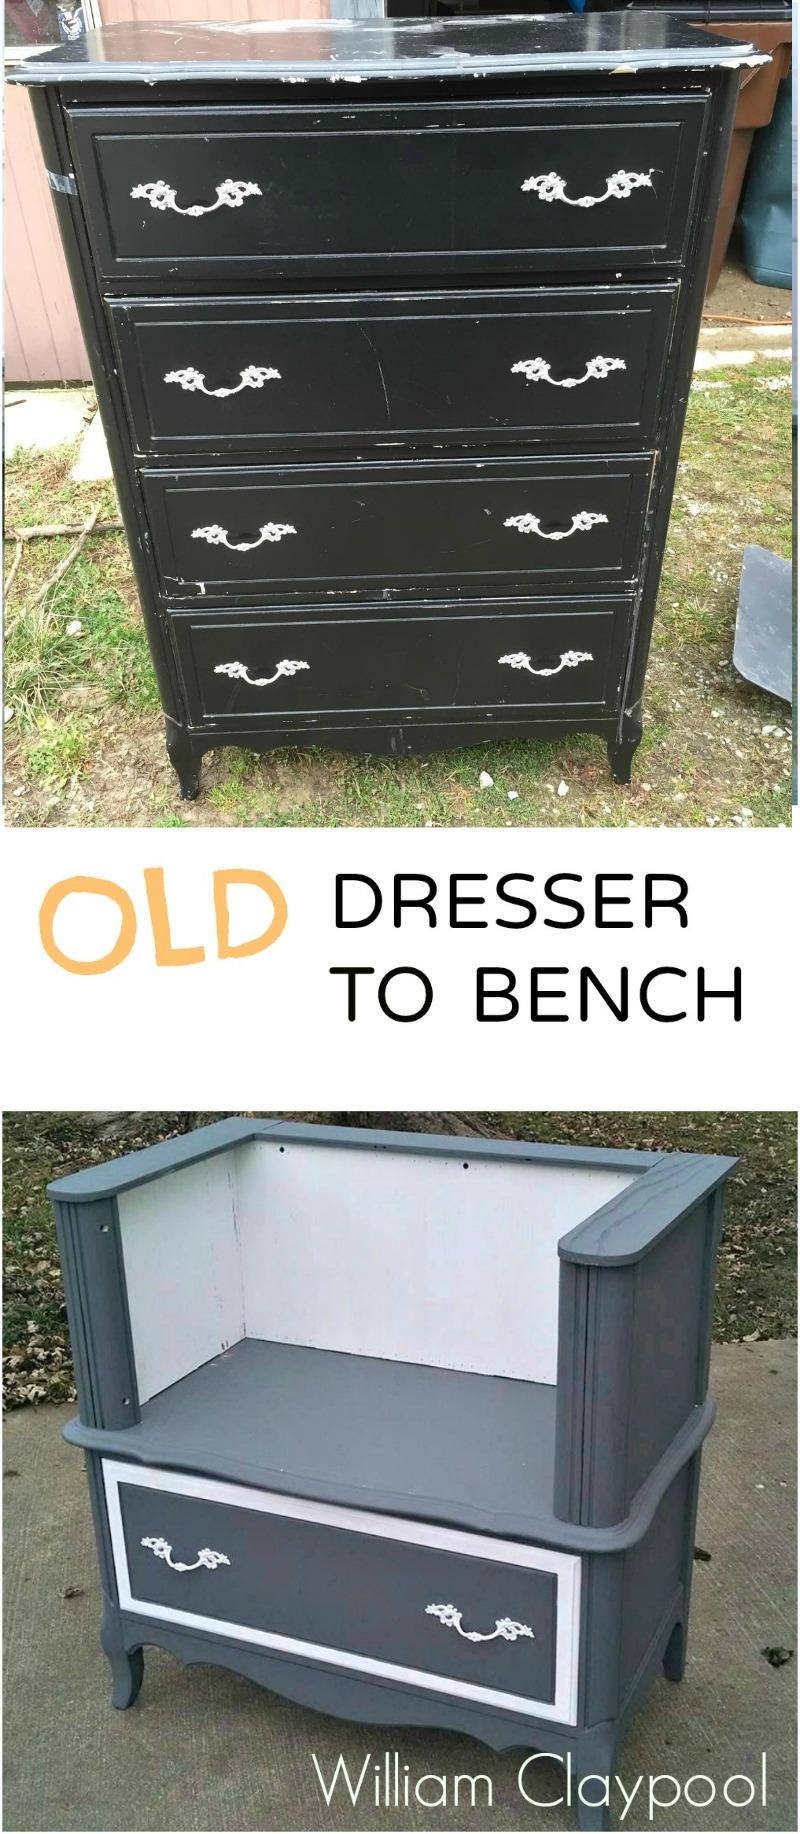 Old dresser to bench 1